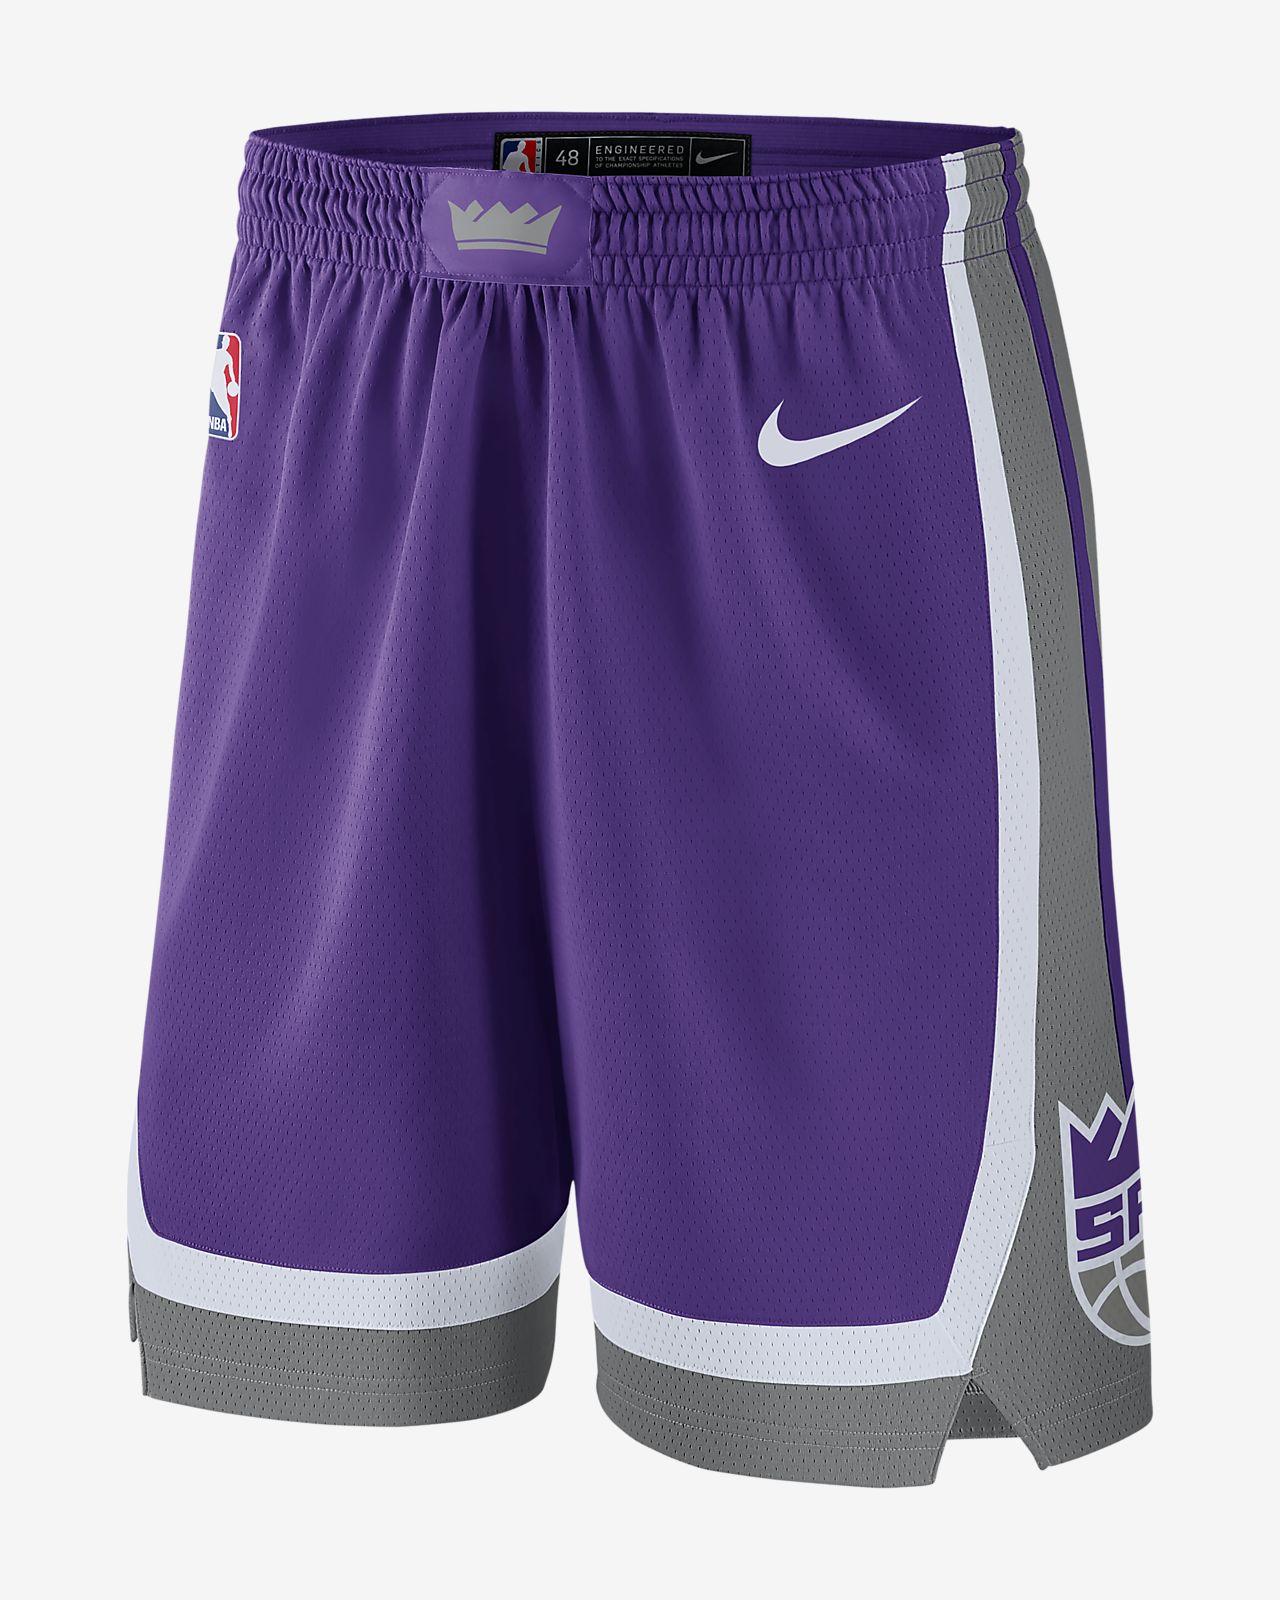 Sacramento Kings Icon Edition Swingman Nike NBA-Shorts für Herren